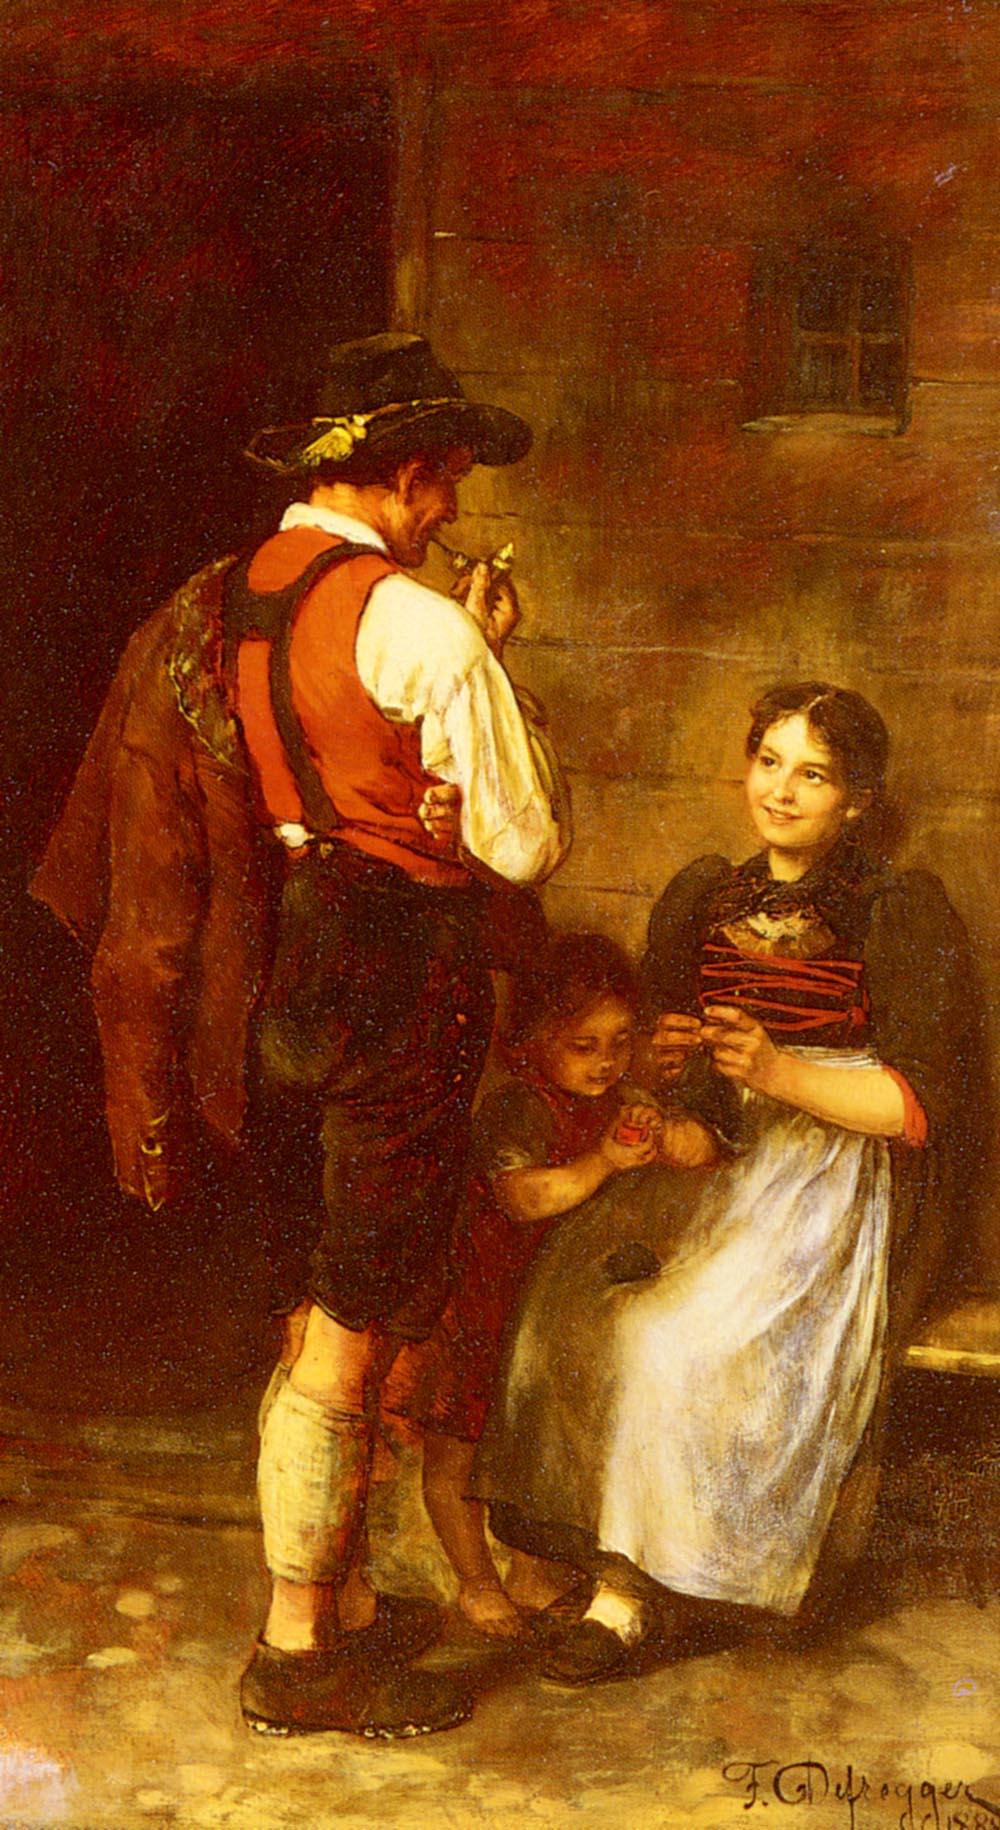 The Happy Family :: Franz Von Defregger - Romantic scenes in art and painting ôîòî